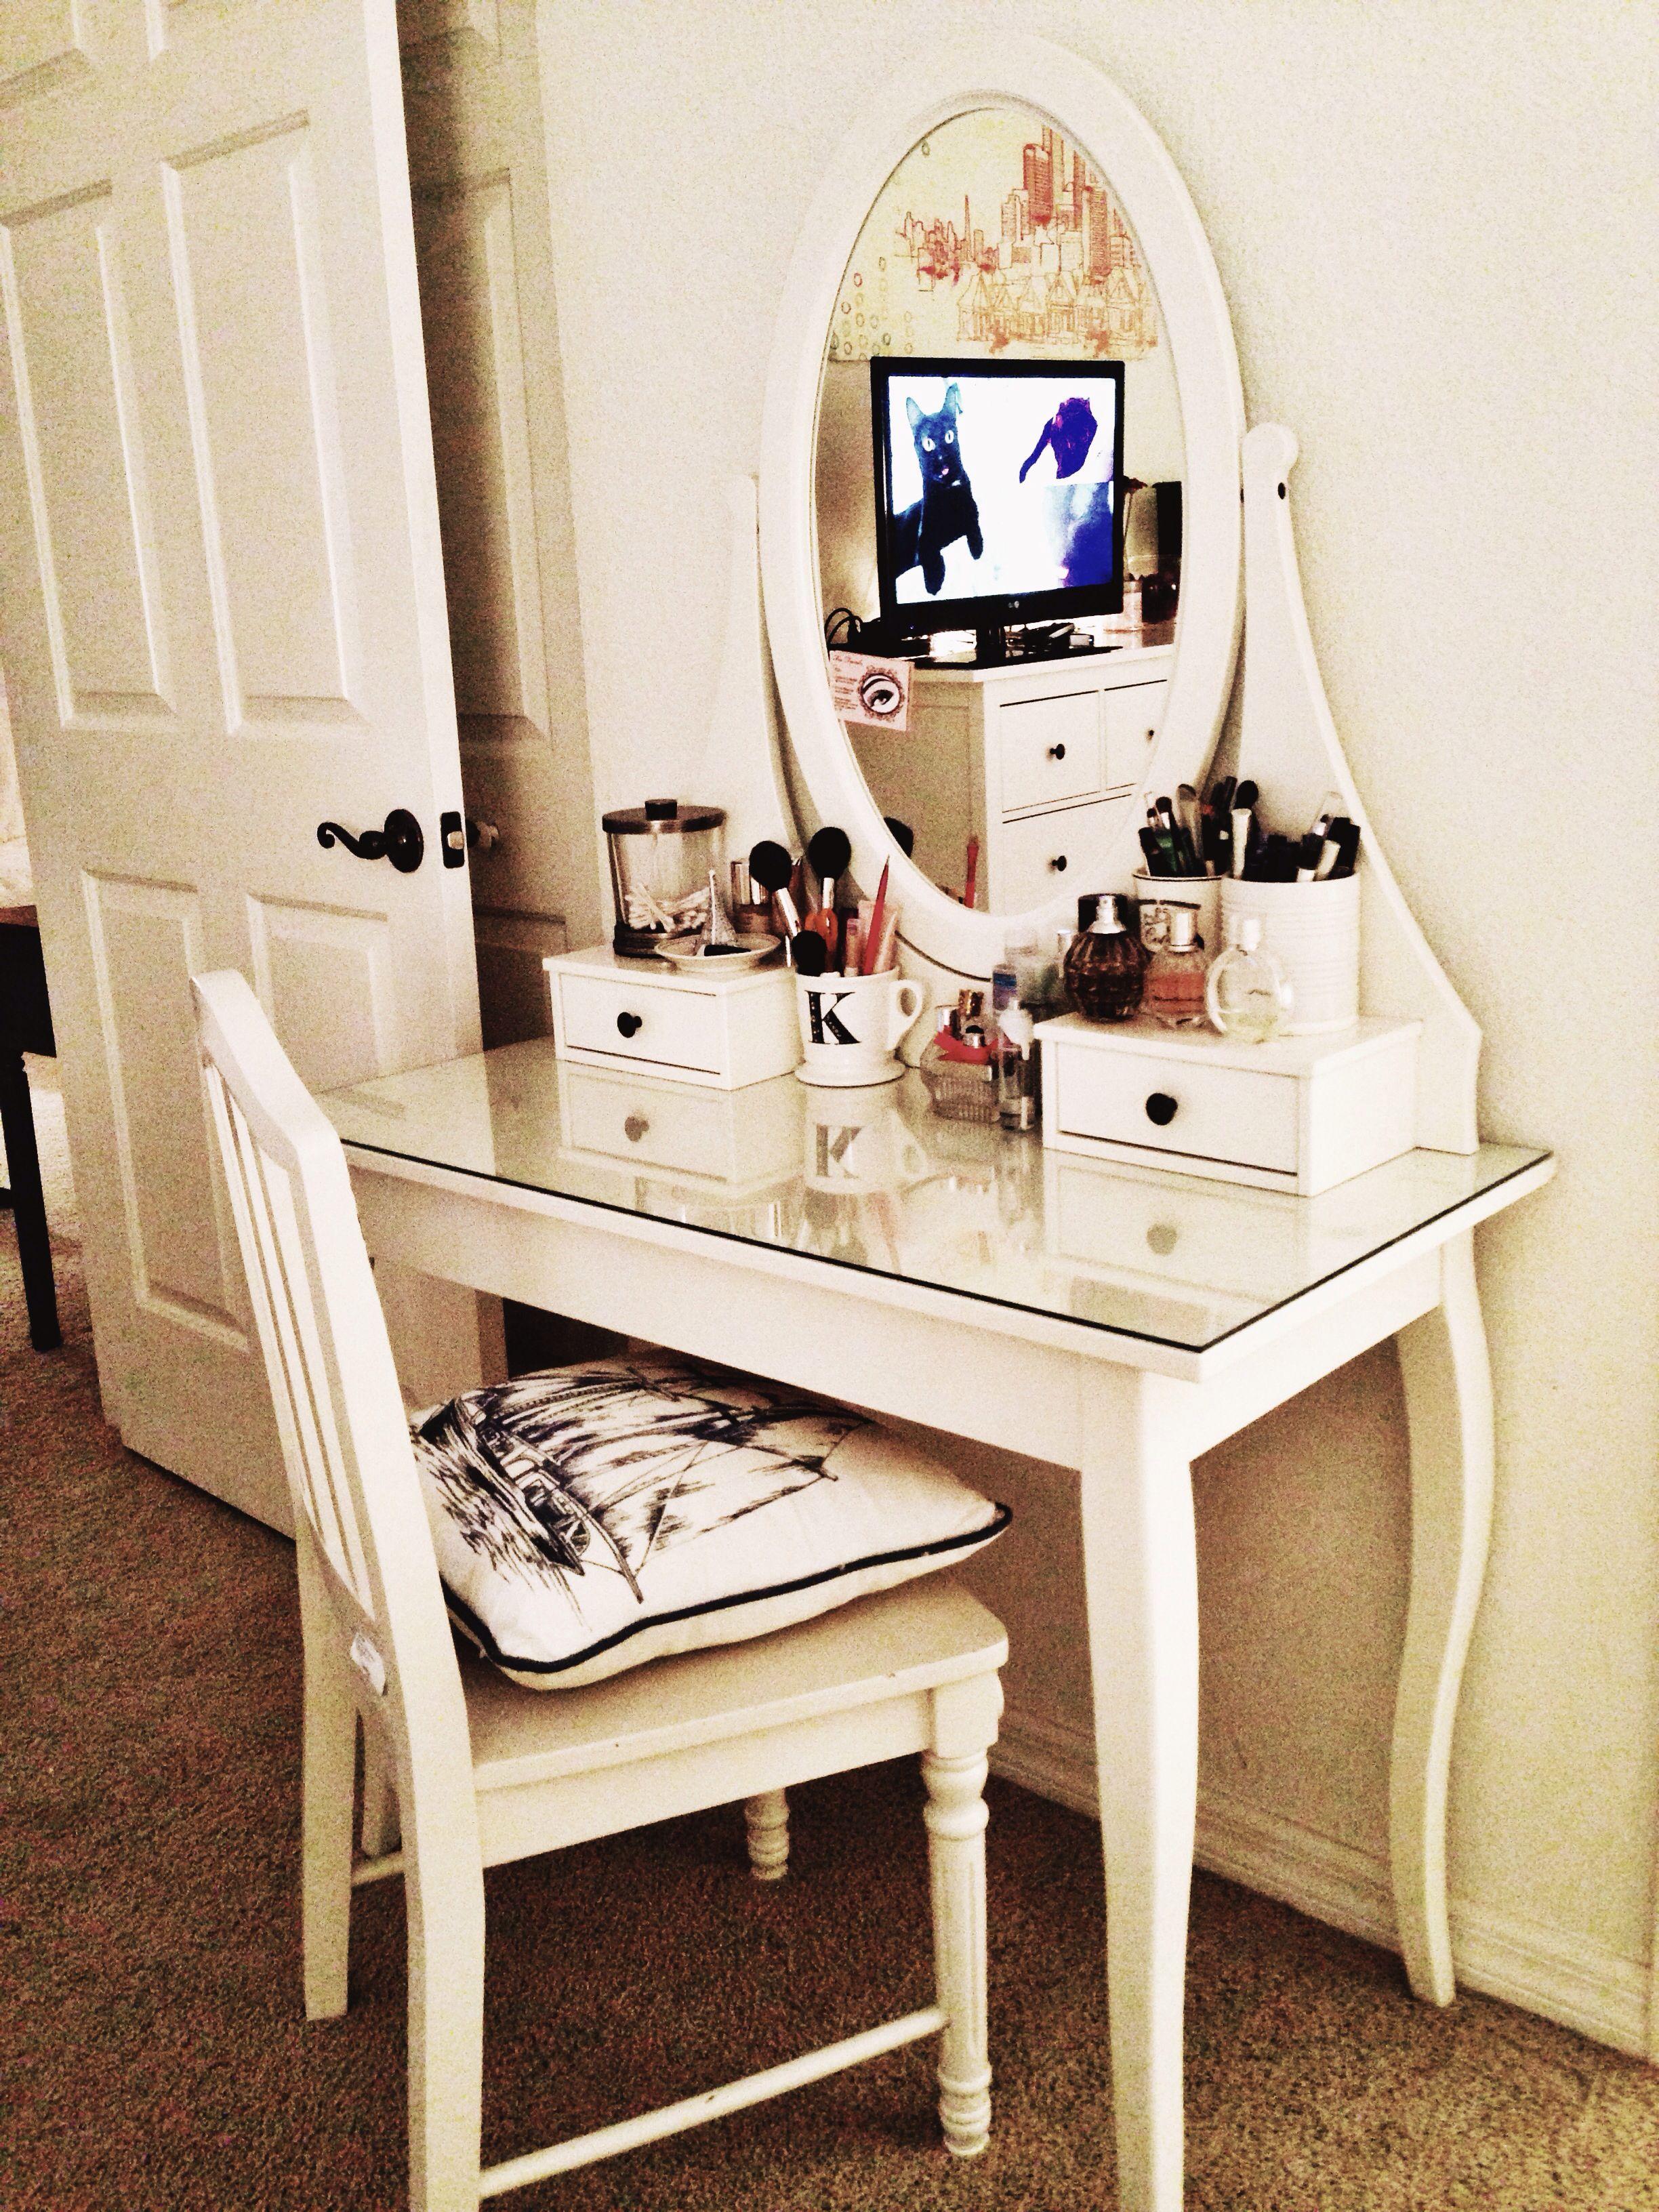 ikea vanity chair junior my new hemnes dressing table from yay hamnes